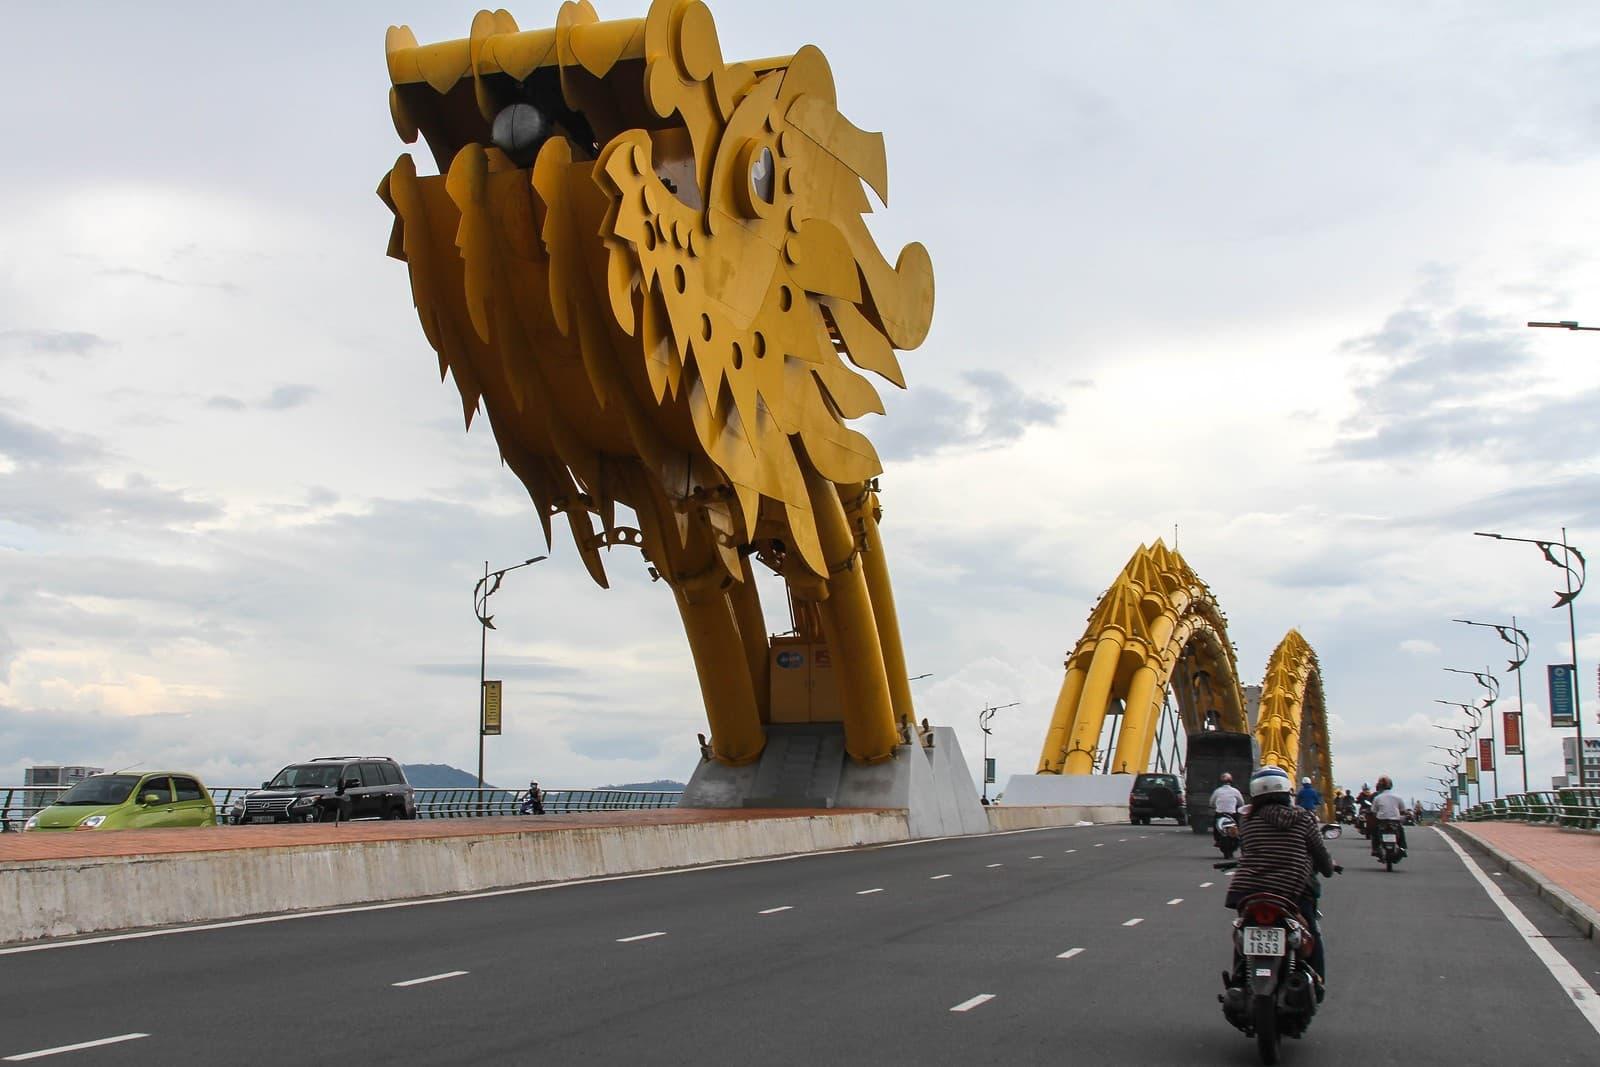 cabeza del dragon puente da nang